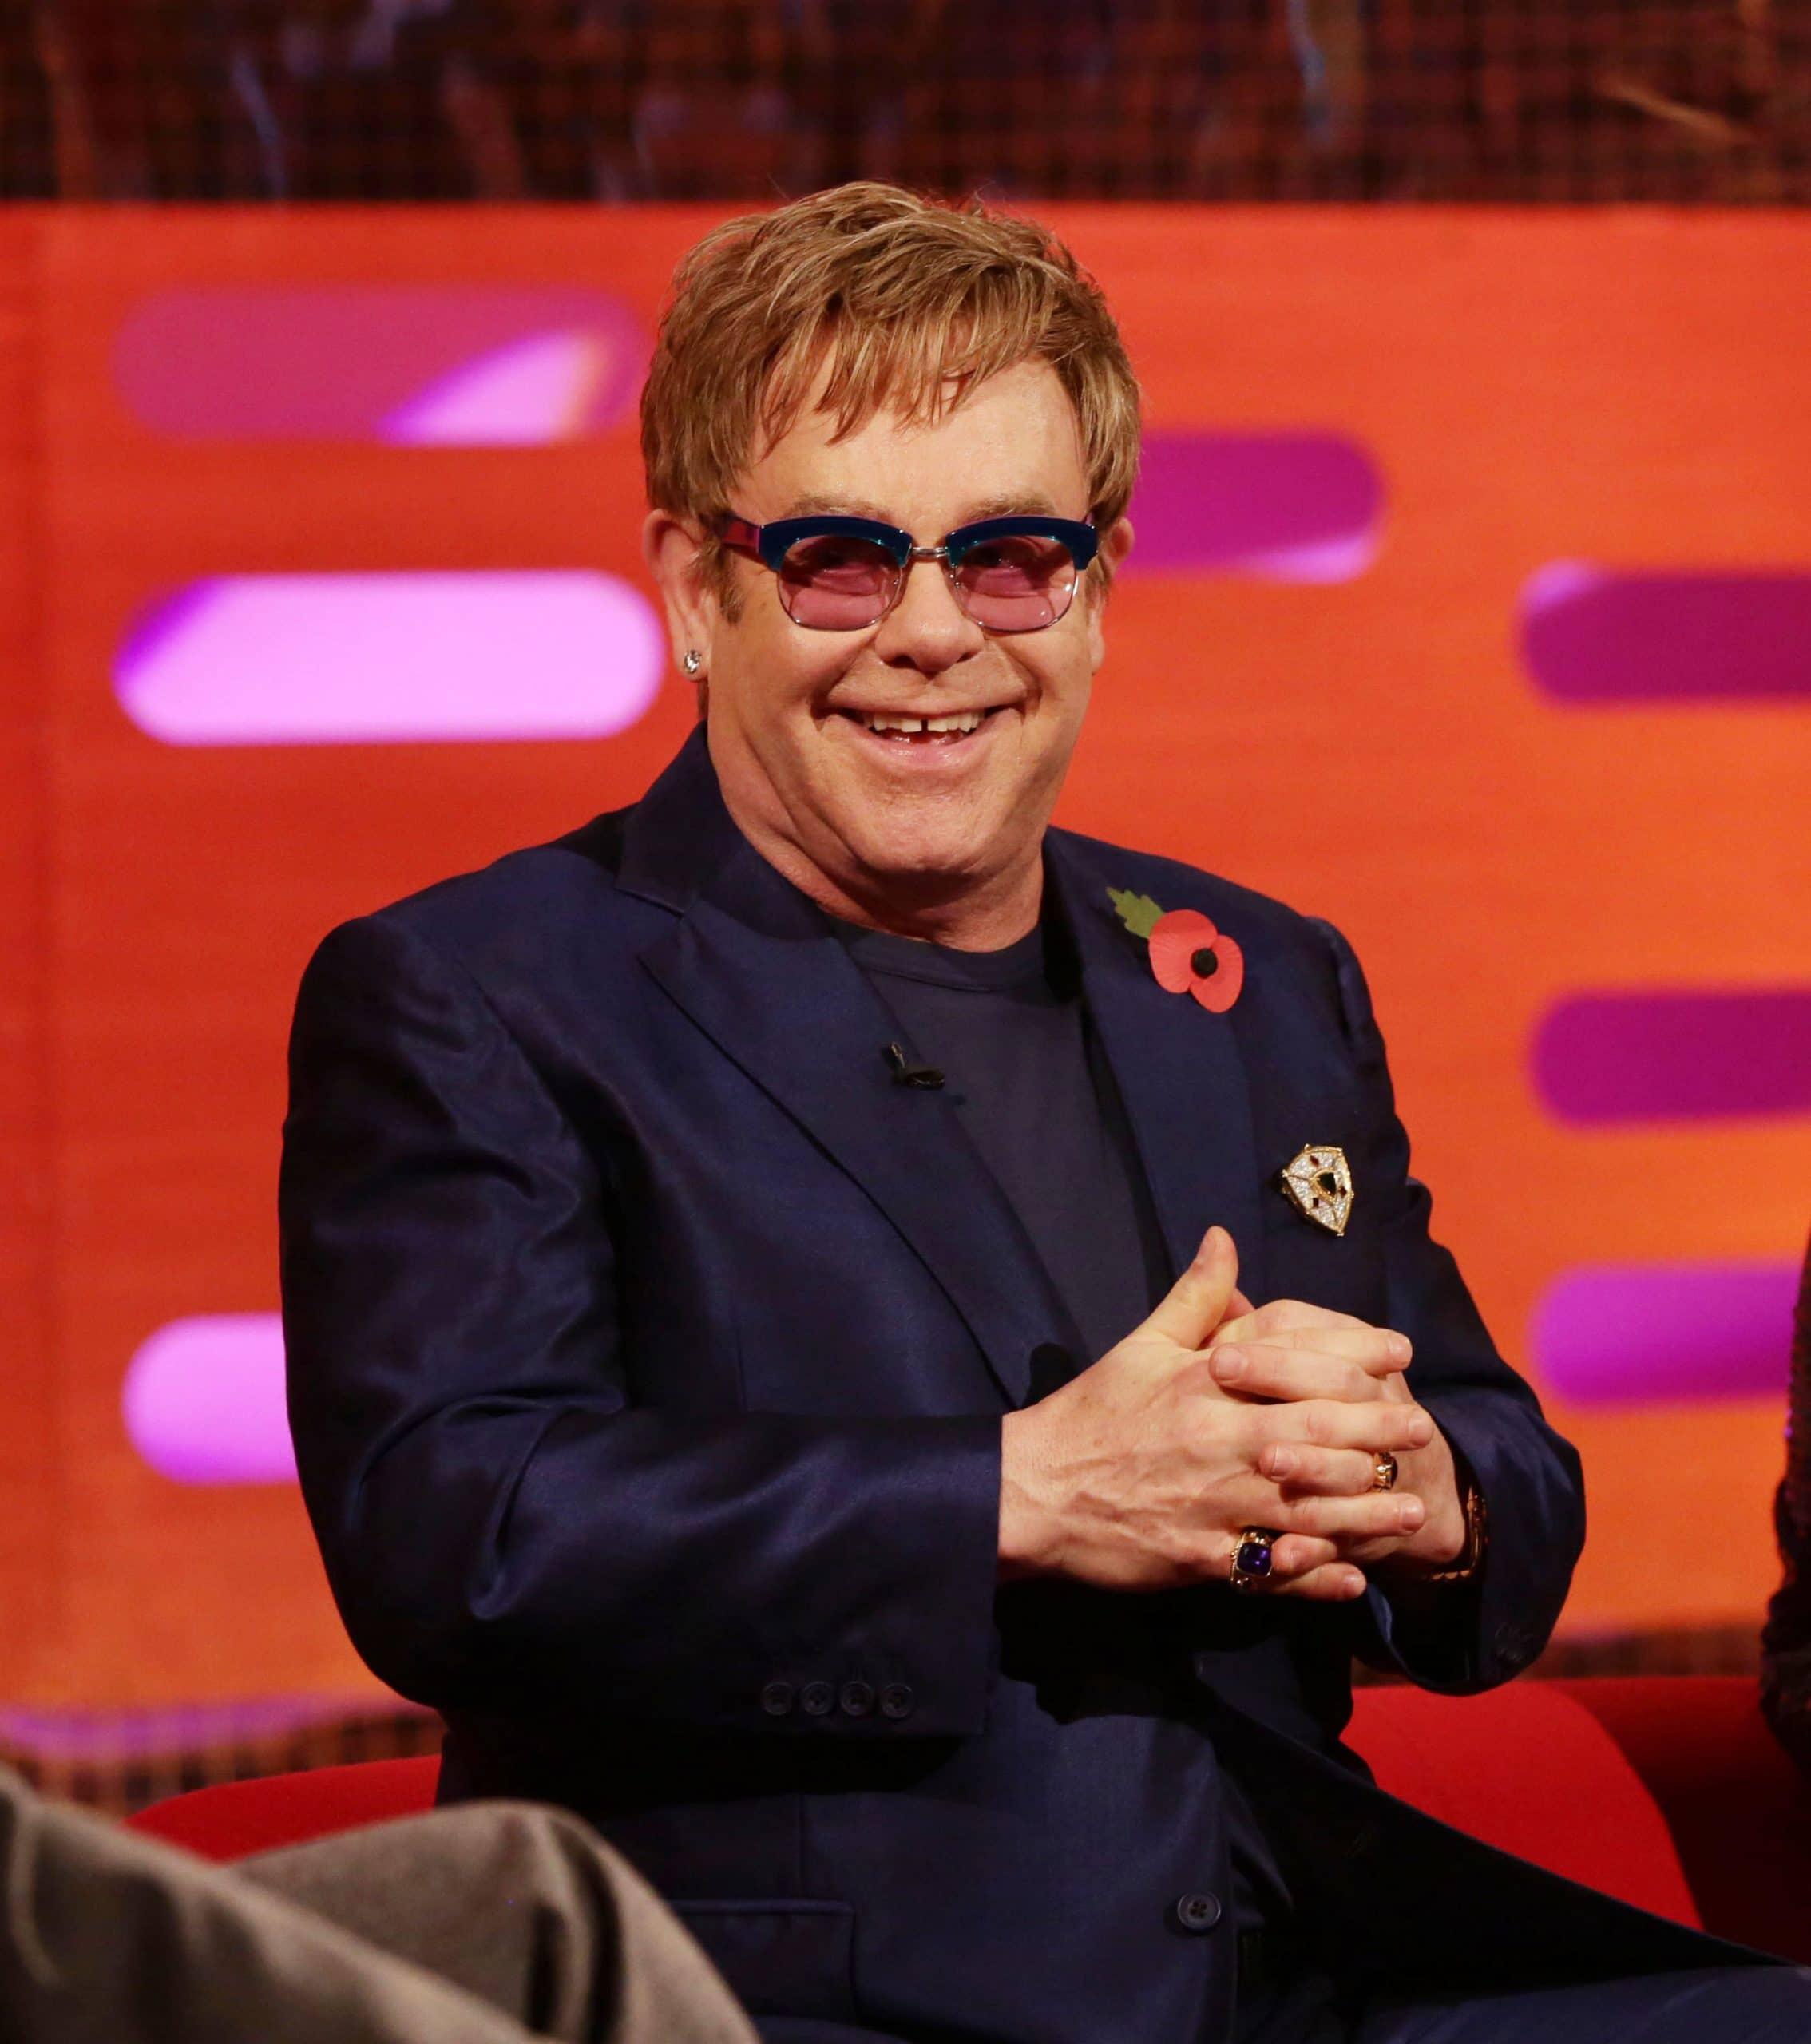 THE GRAHAM NORTON SHOW, Elton John